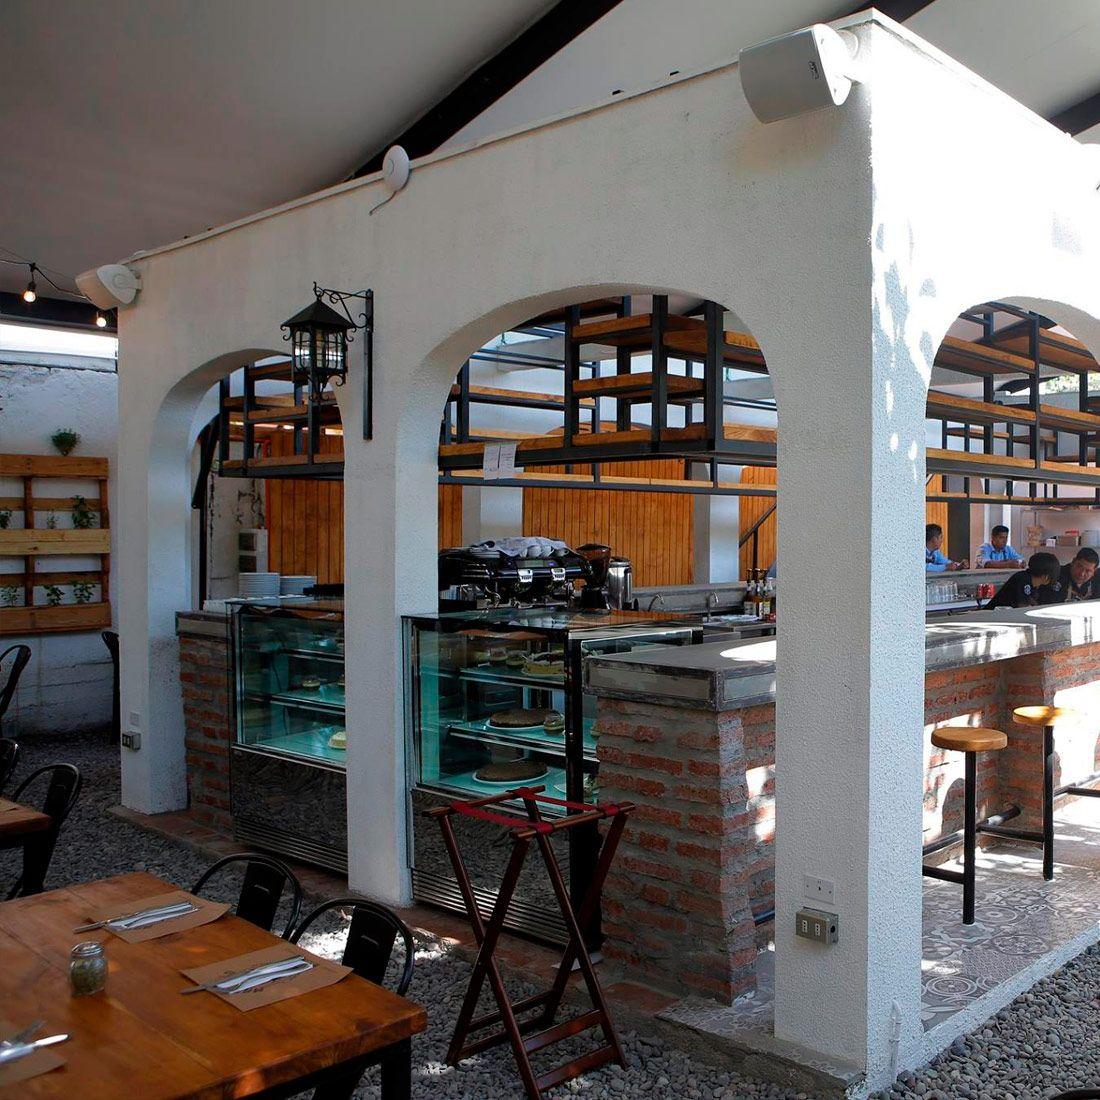 MATTARELLO Restaurante - Reserva en restaurantes de Comida ITALIANA / PASTAS - LA REINA - MESA 24/7 | SANTIAGO - Perú